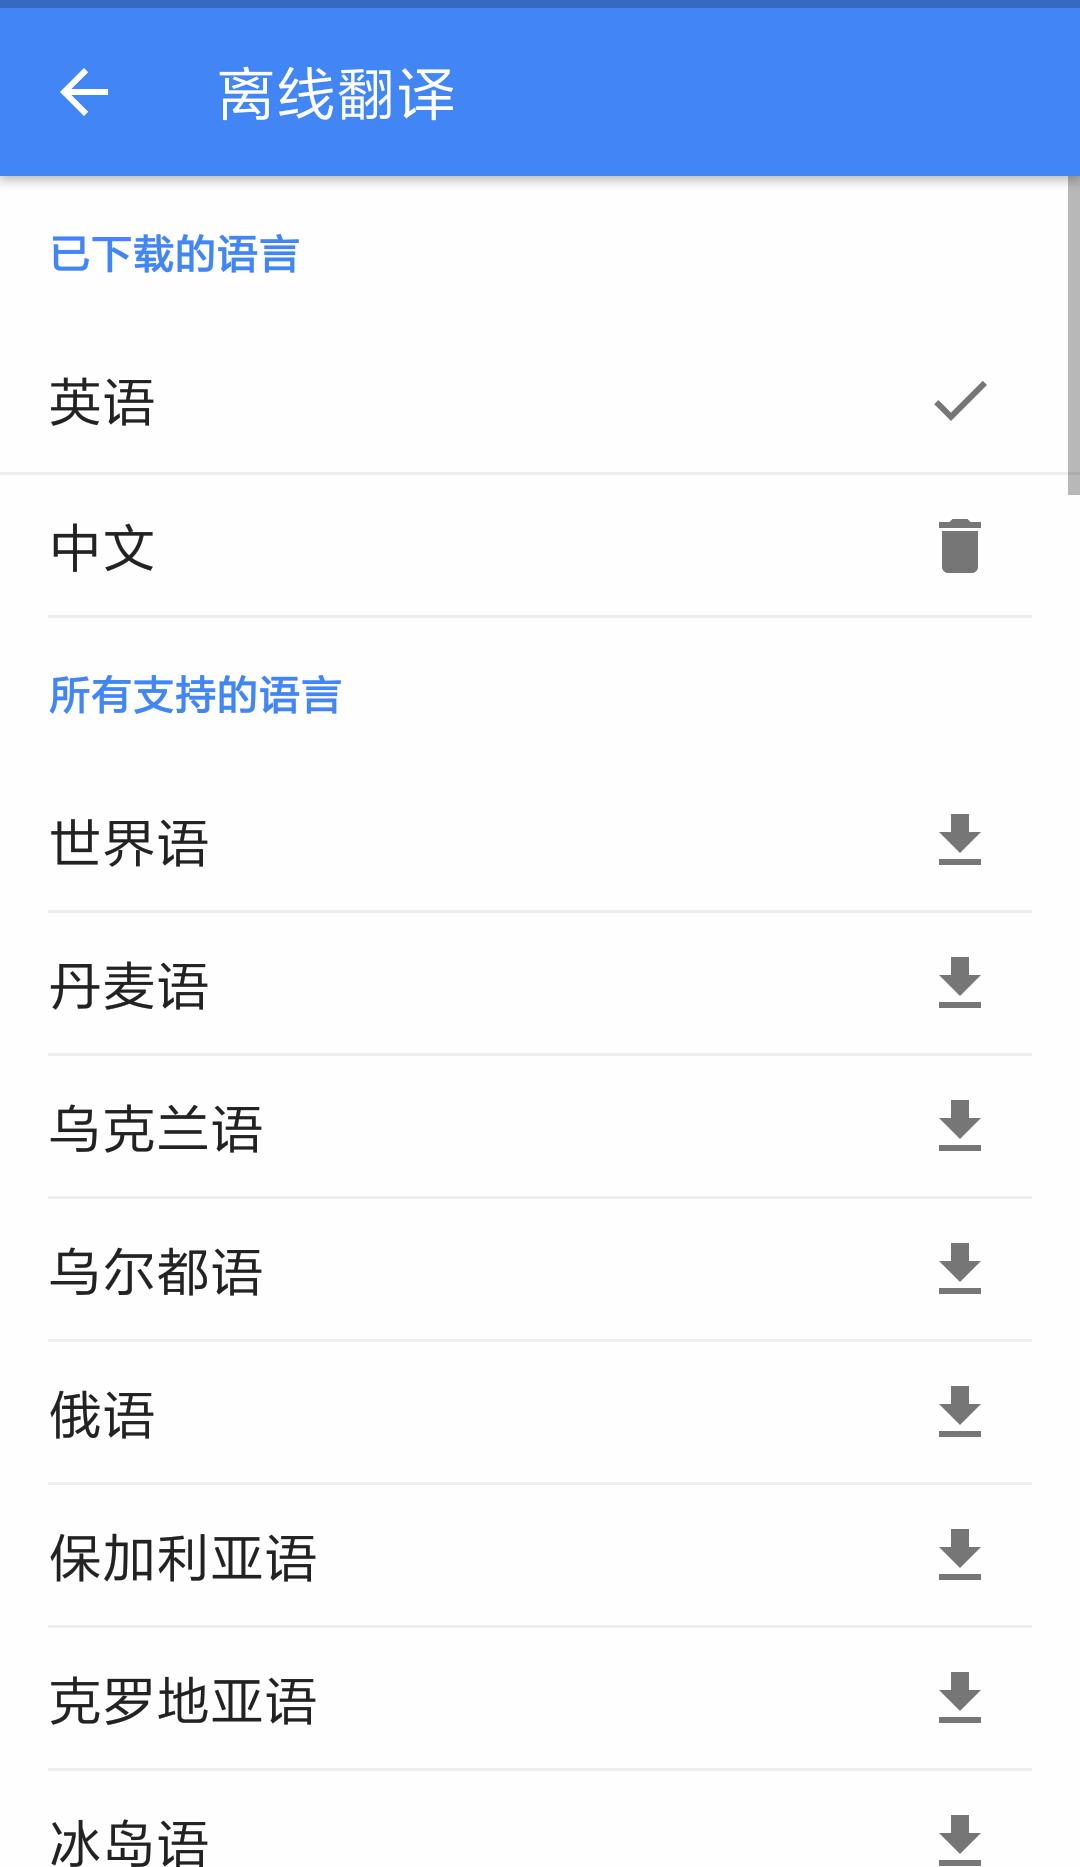 twitter国内能用么_google翻译app在中国可以用吗_百度知道